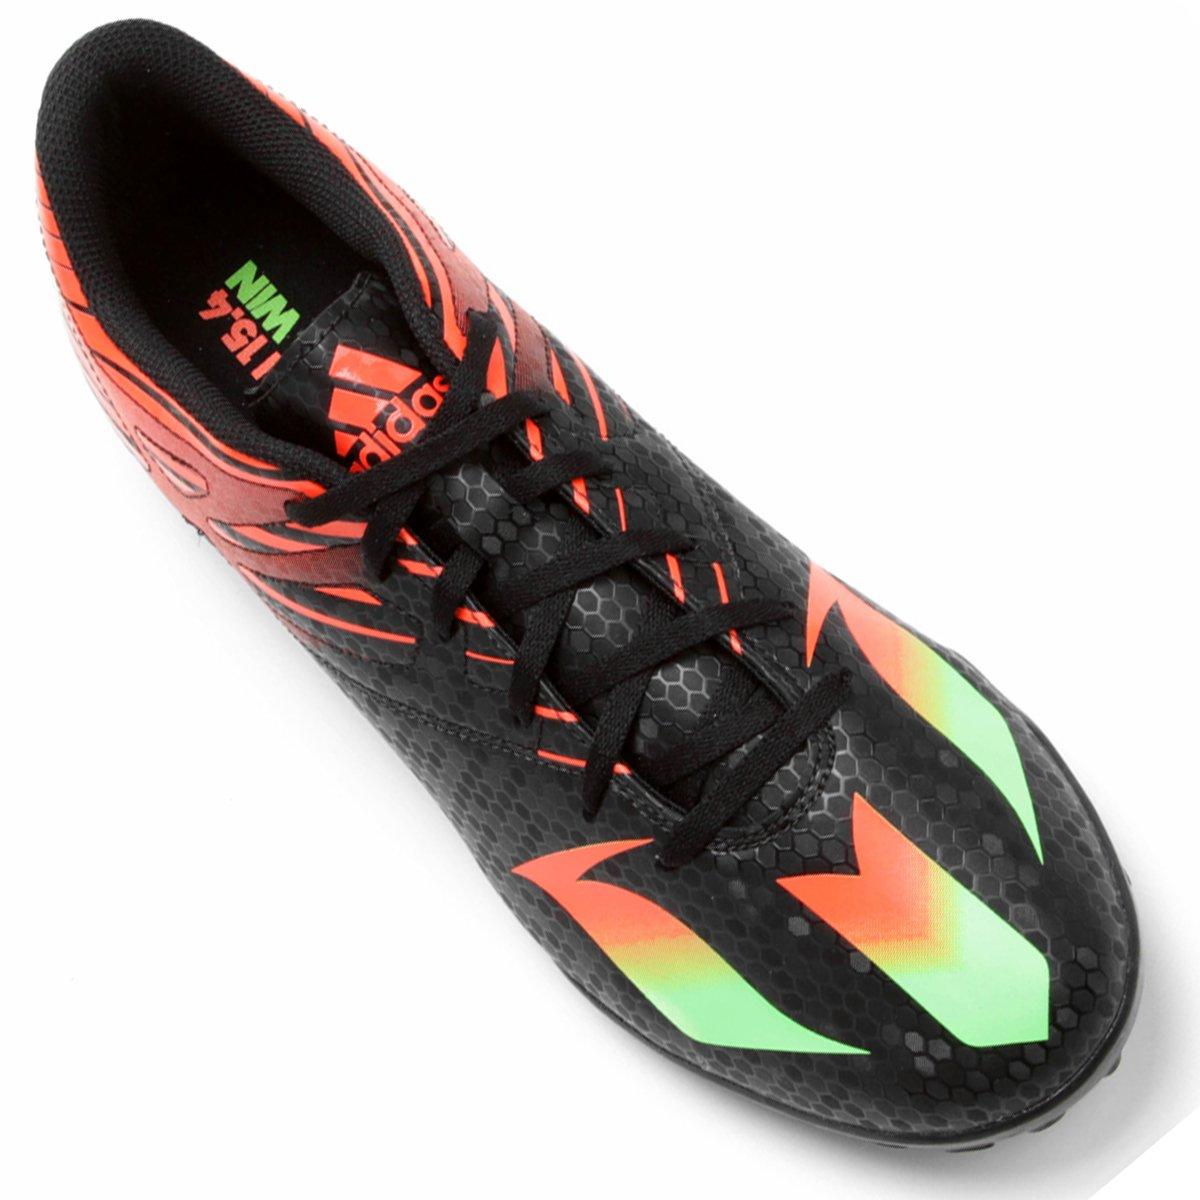 Chuteira Society Adidas Messi 15.4 TF Masculina - Compre Agora ... b478f01267fa8